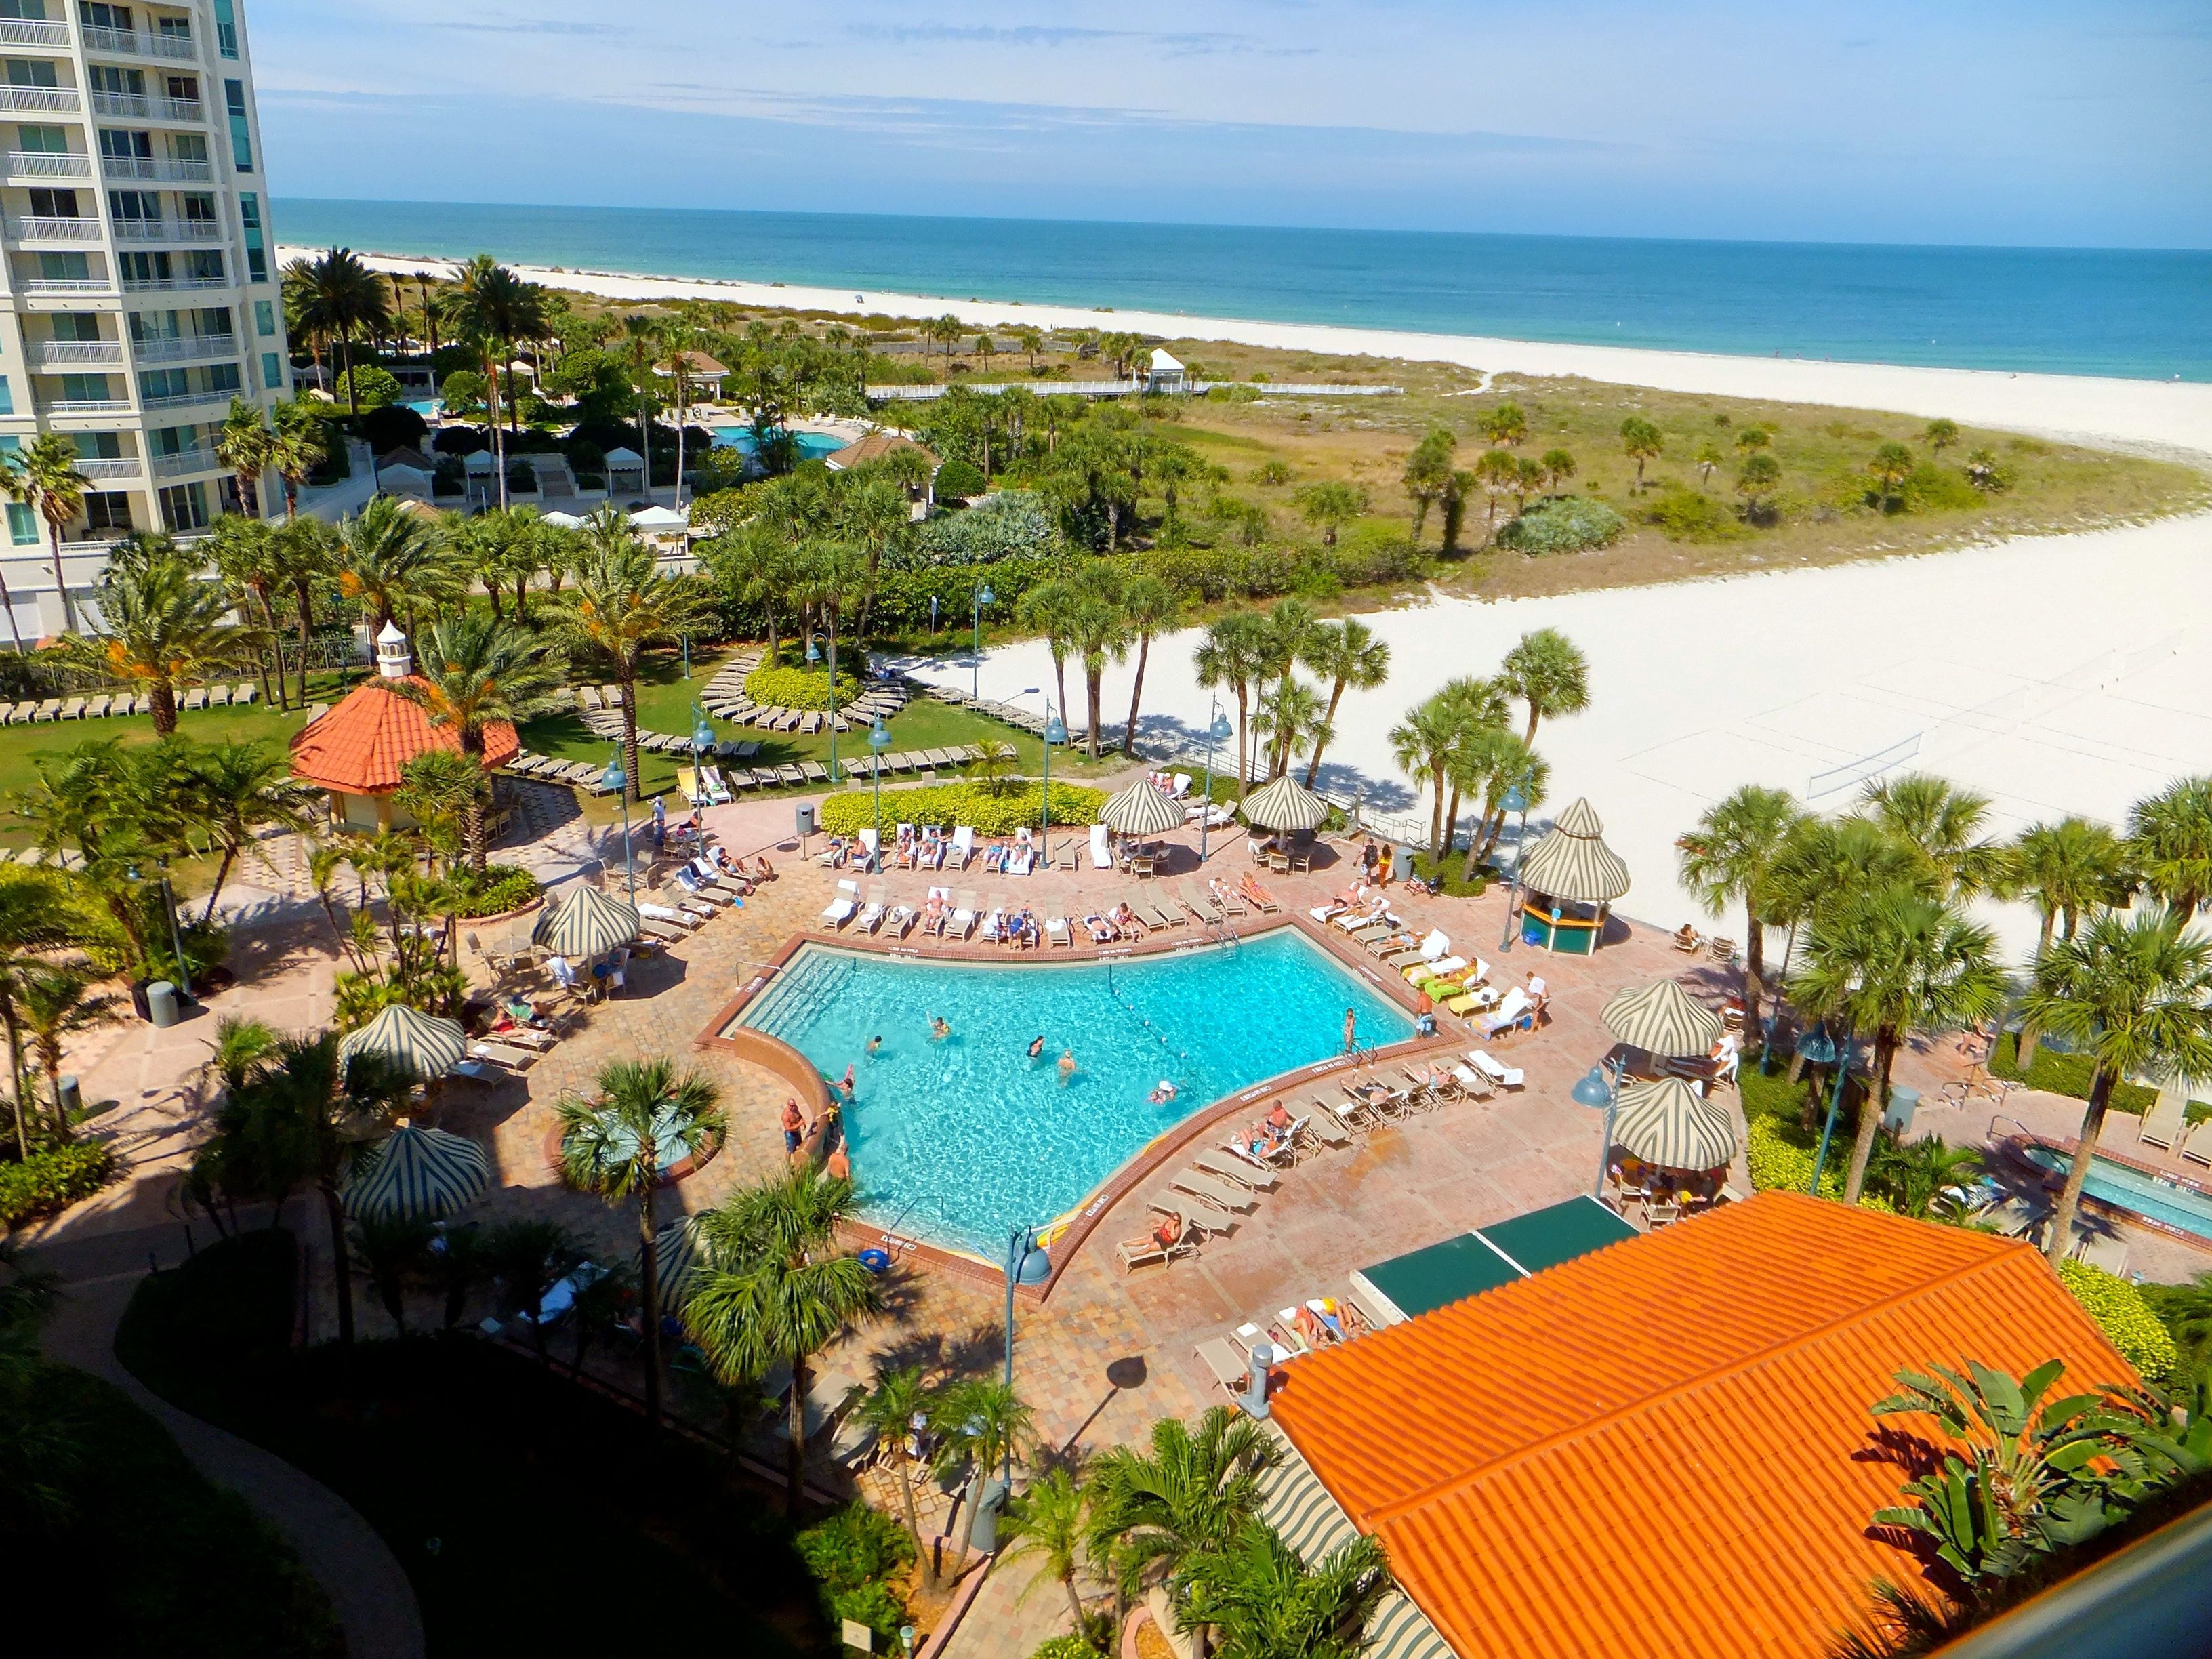 Our Amazing Pool At Beach Sheraton Sand Key Clearwater Www Sheratonsandkey